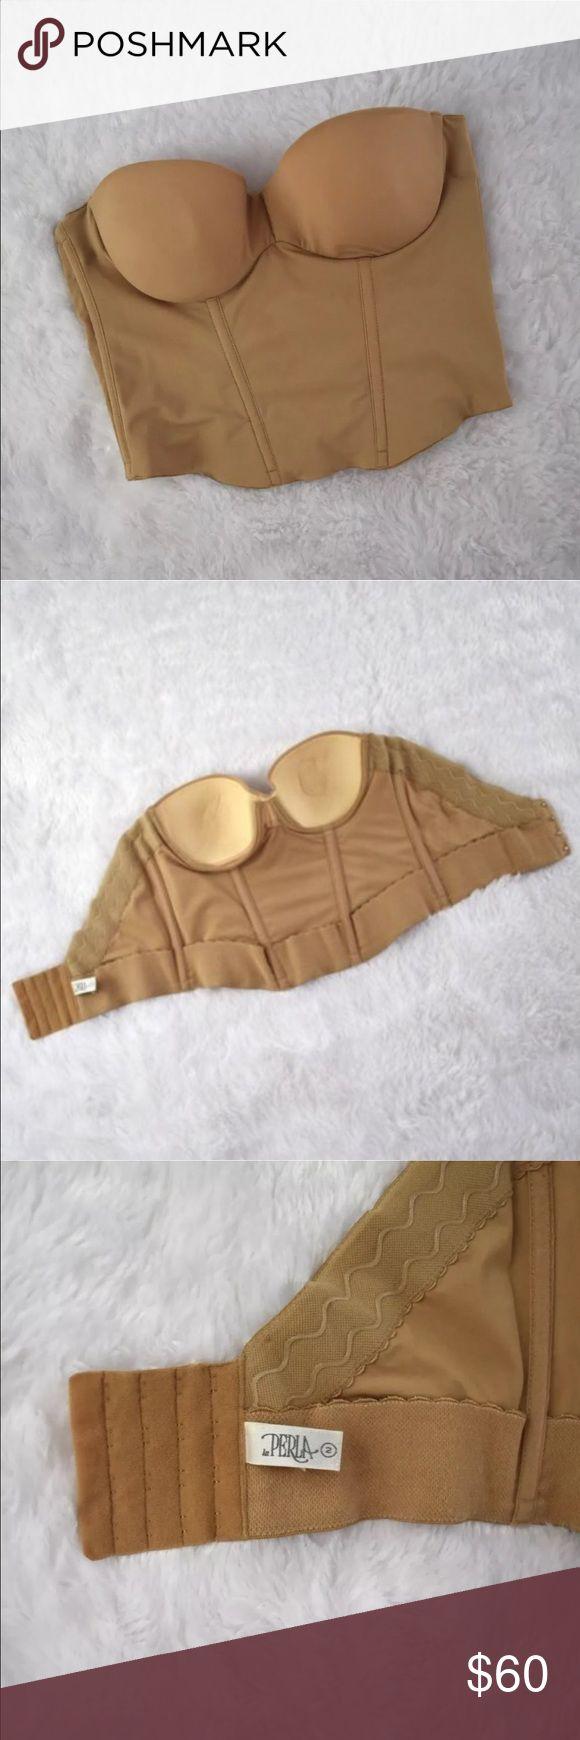 La Perla Low Back Strapless Corset Bra Gently used without flaws. Size 34B La Perla Intimates & Sleepwear Bras